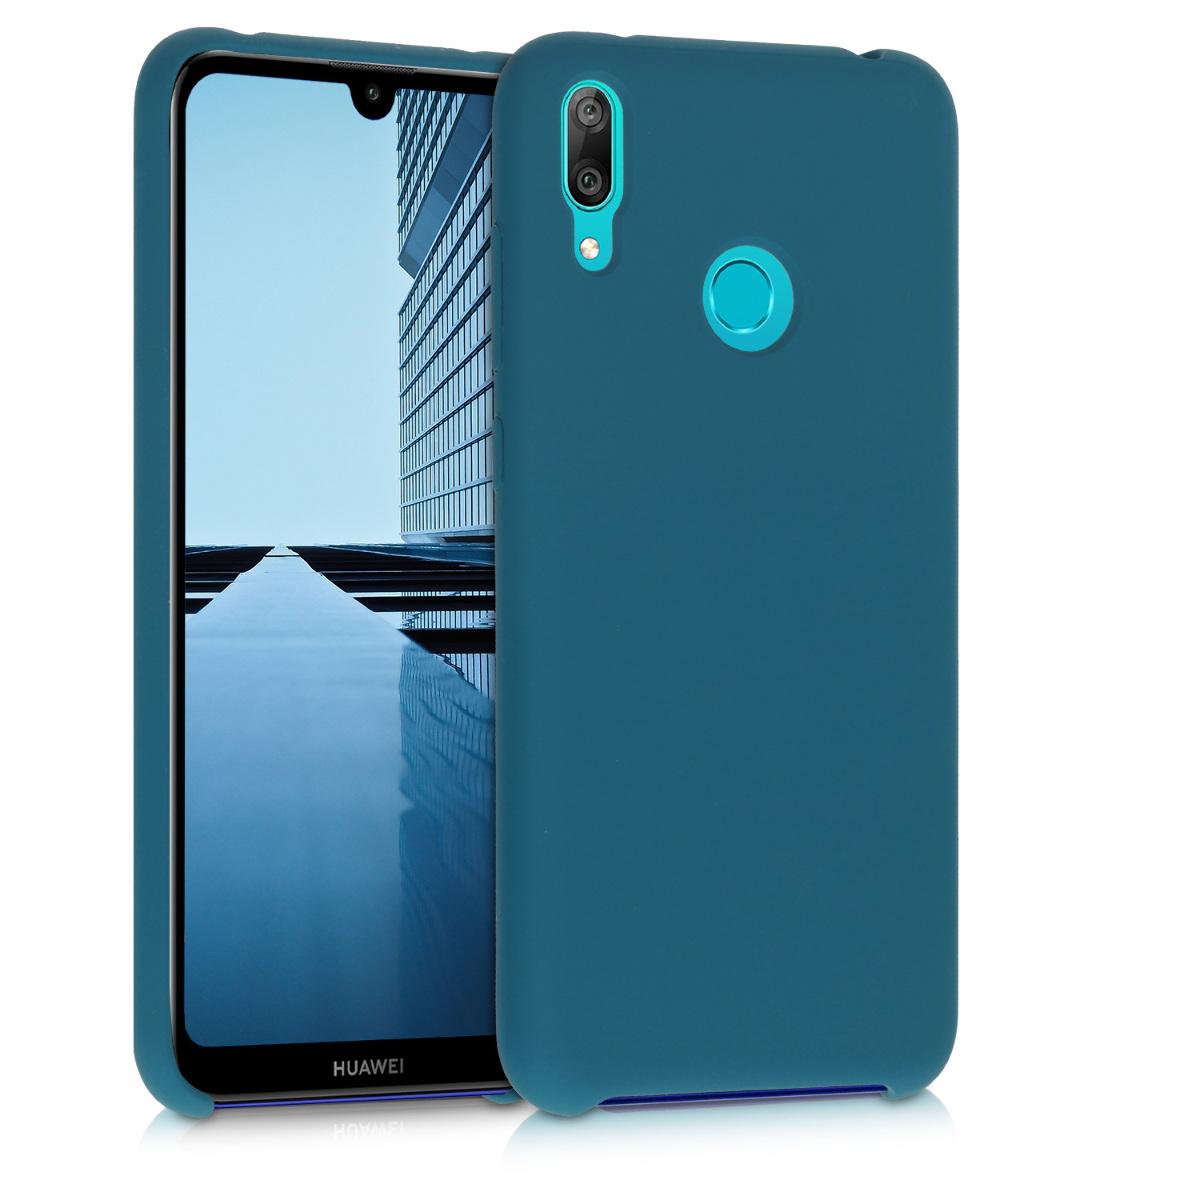 KW Θήκη Σιλικόνης Huawei Y7 2019 / Y7 Prime 2019 - Soft Flexible Rubber - Teal Matte (50686.57)